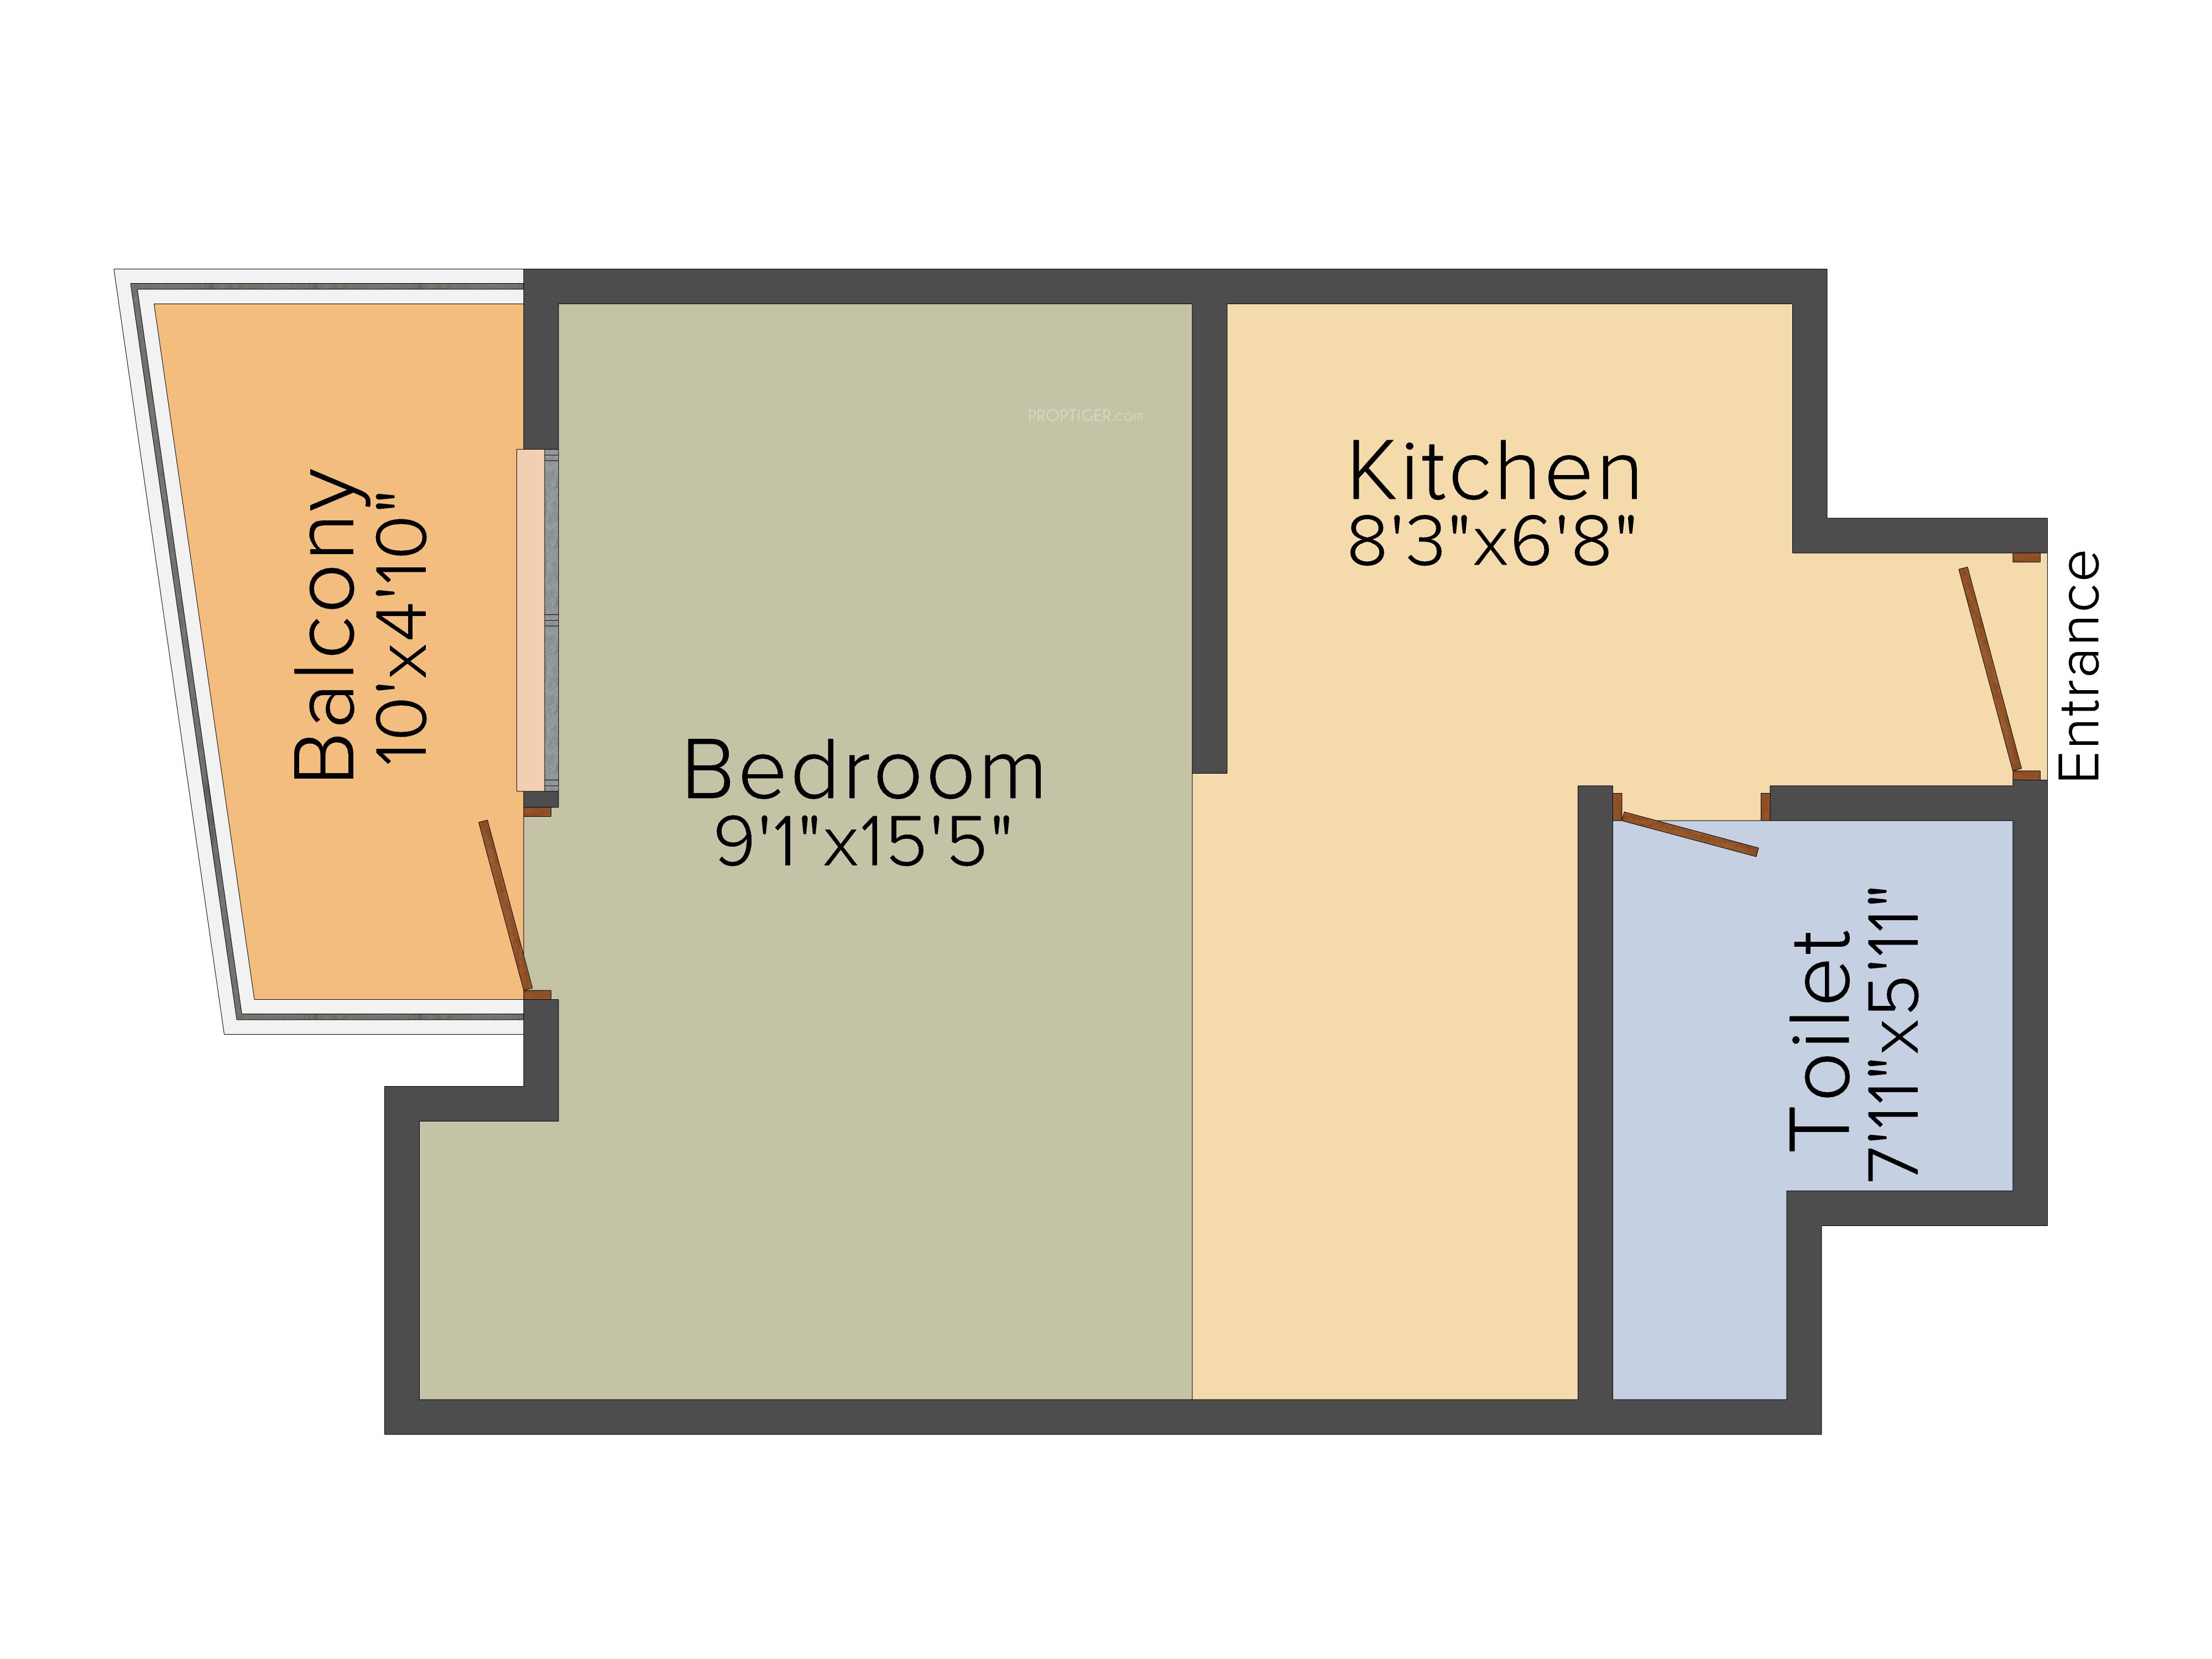 The Breakers Floor Plan Stellar Mi Citihomes In Omicron Greater Noida Price